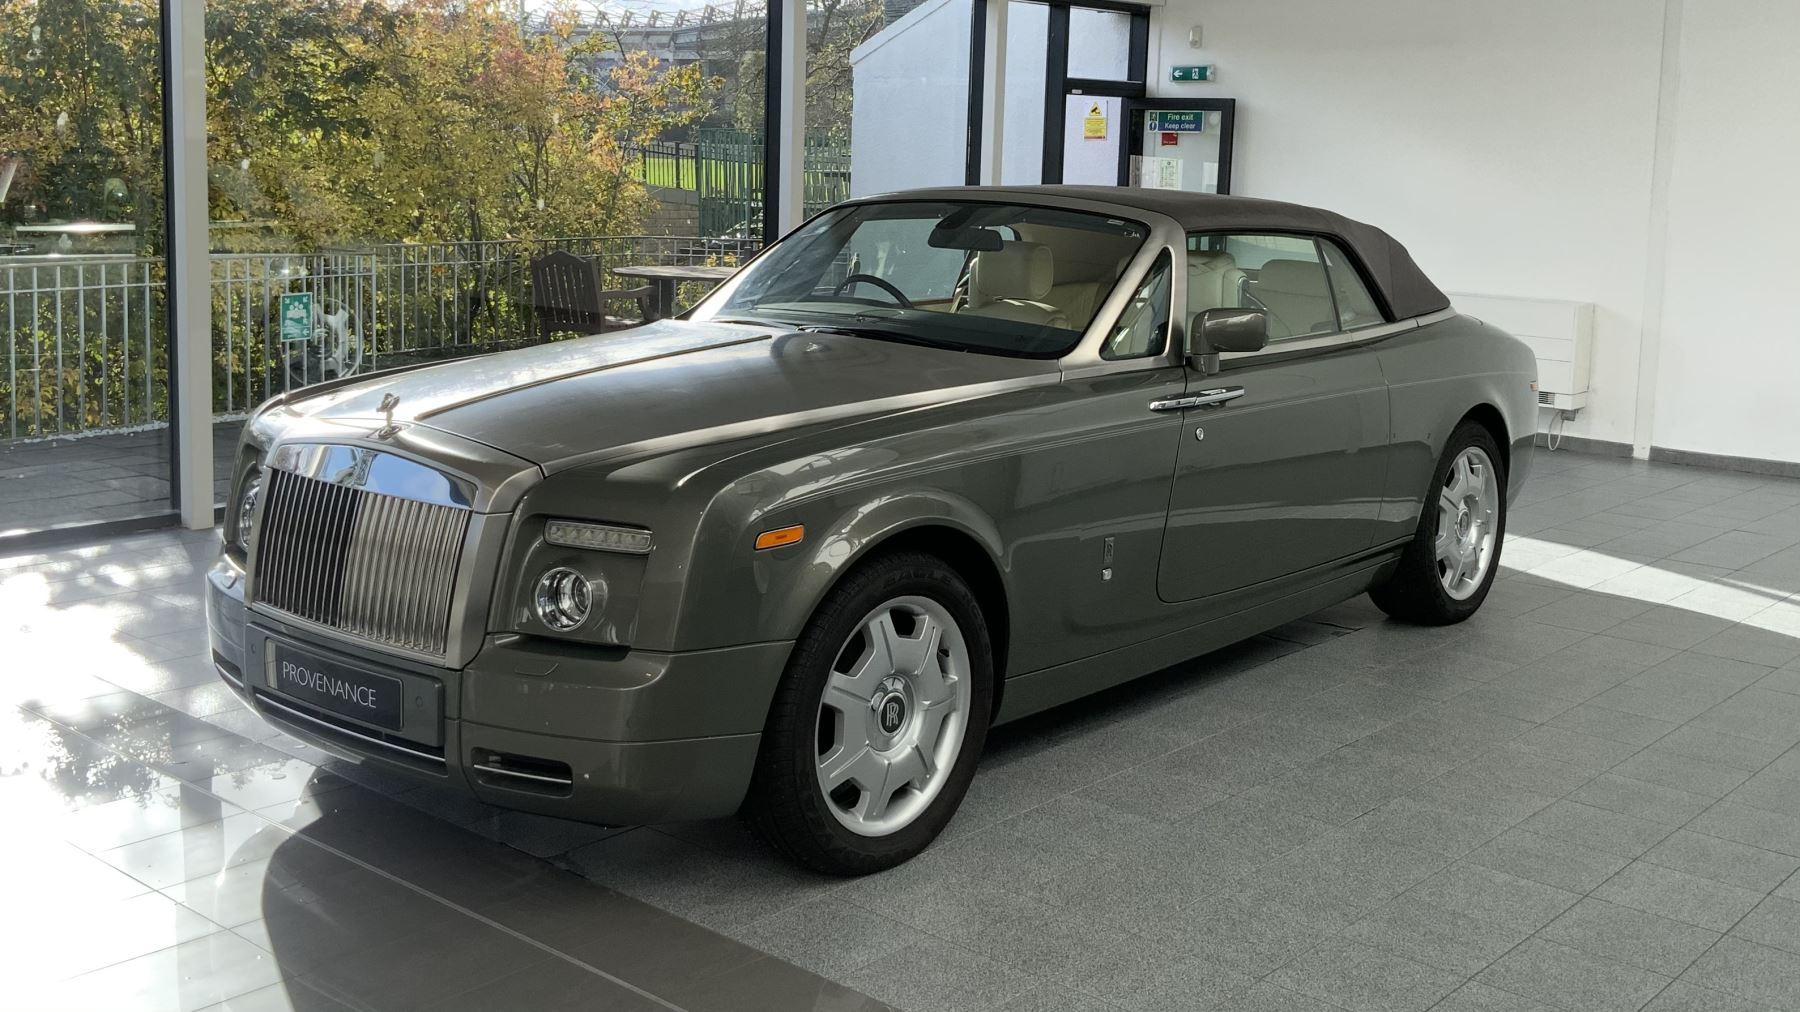 Rolls-Royce Phantom Drophead Coupe 2dr Auto image 7